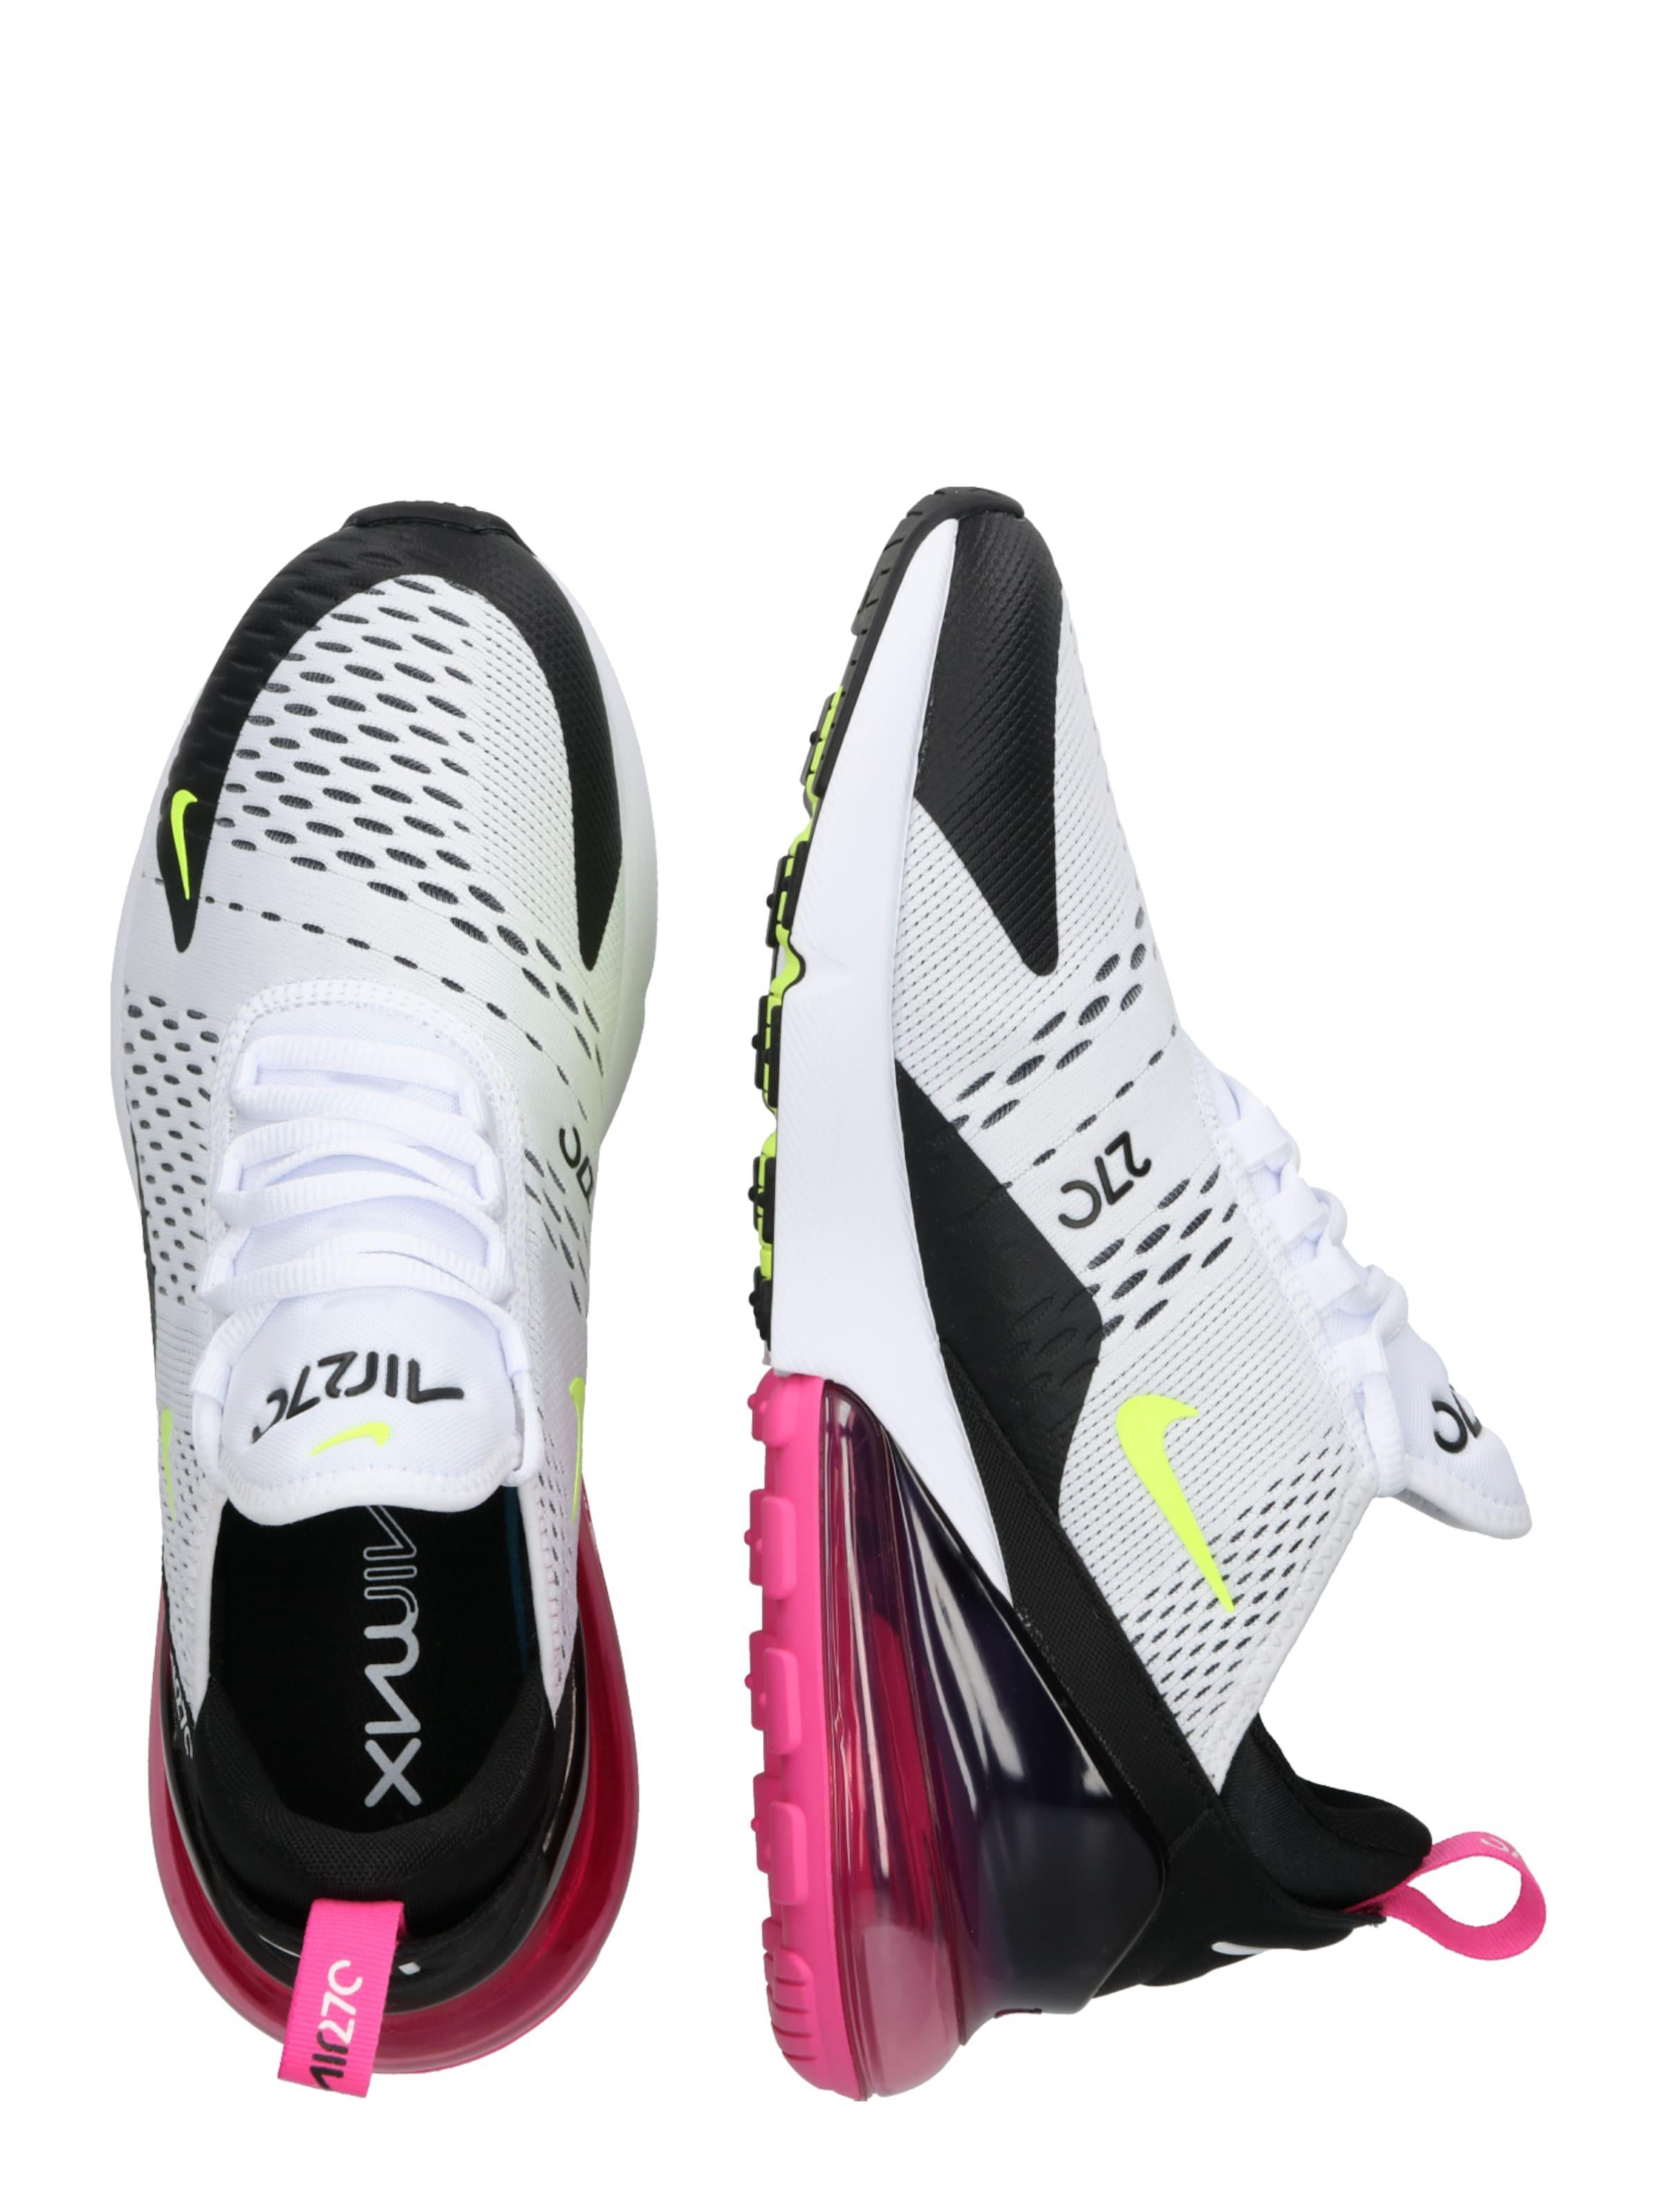 Sportswear Weiß Nike Max 'air Sneaker FuchsiaSchwarz In 270' MqSzGUVp